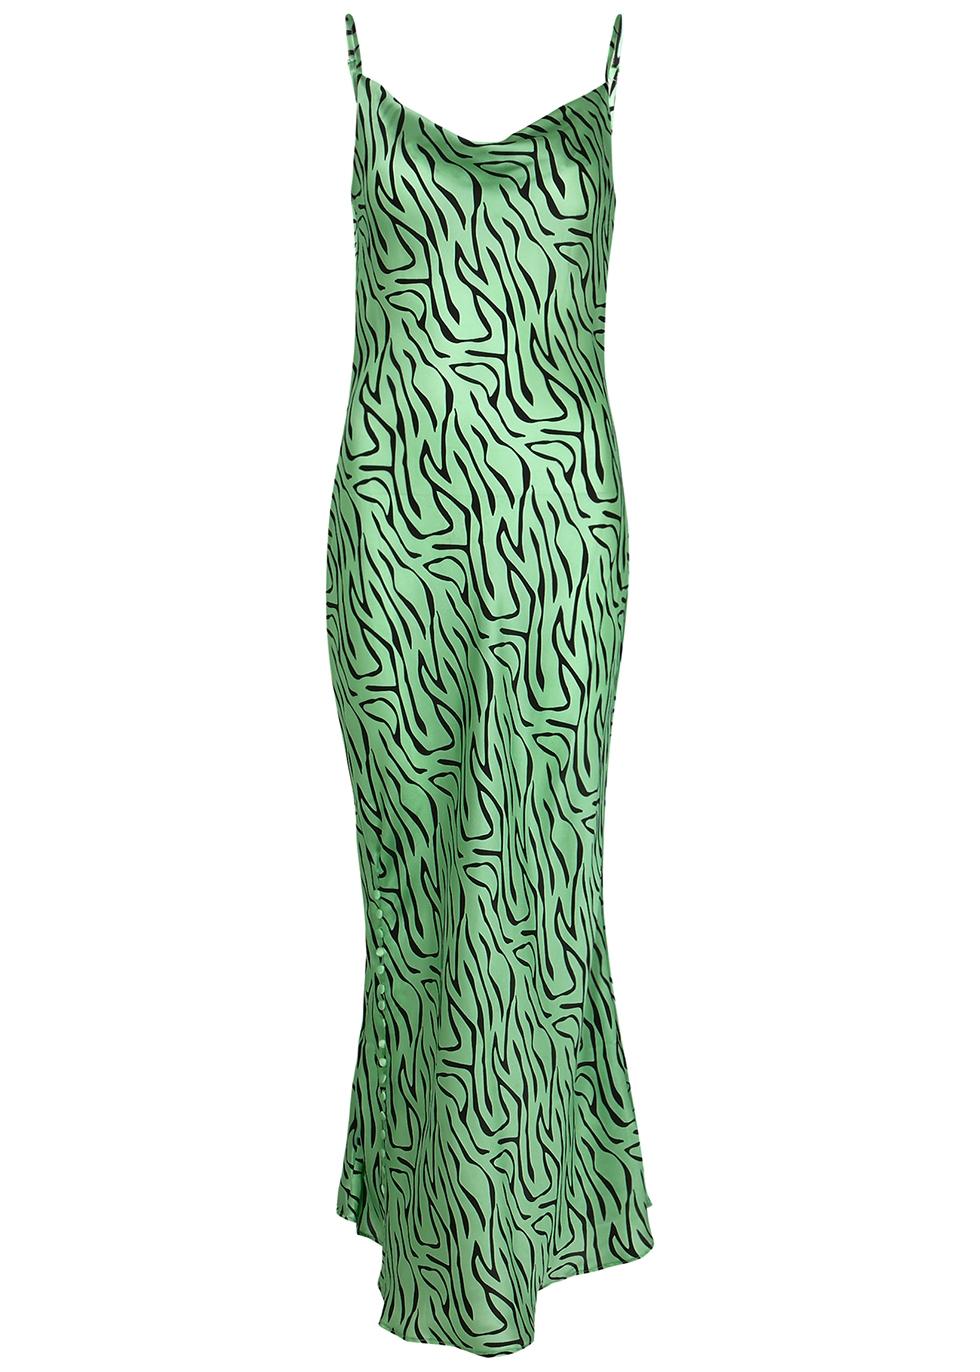 57c0797d56fdf9 Designer Dresses & Designer Gowns - Harvey Nichols